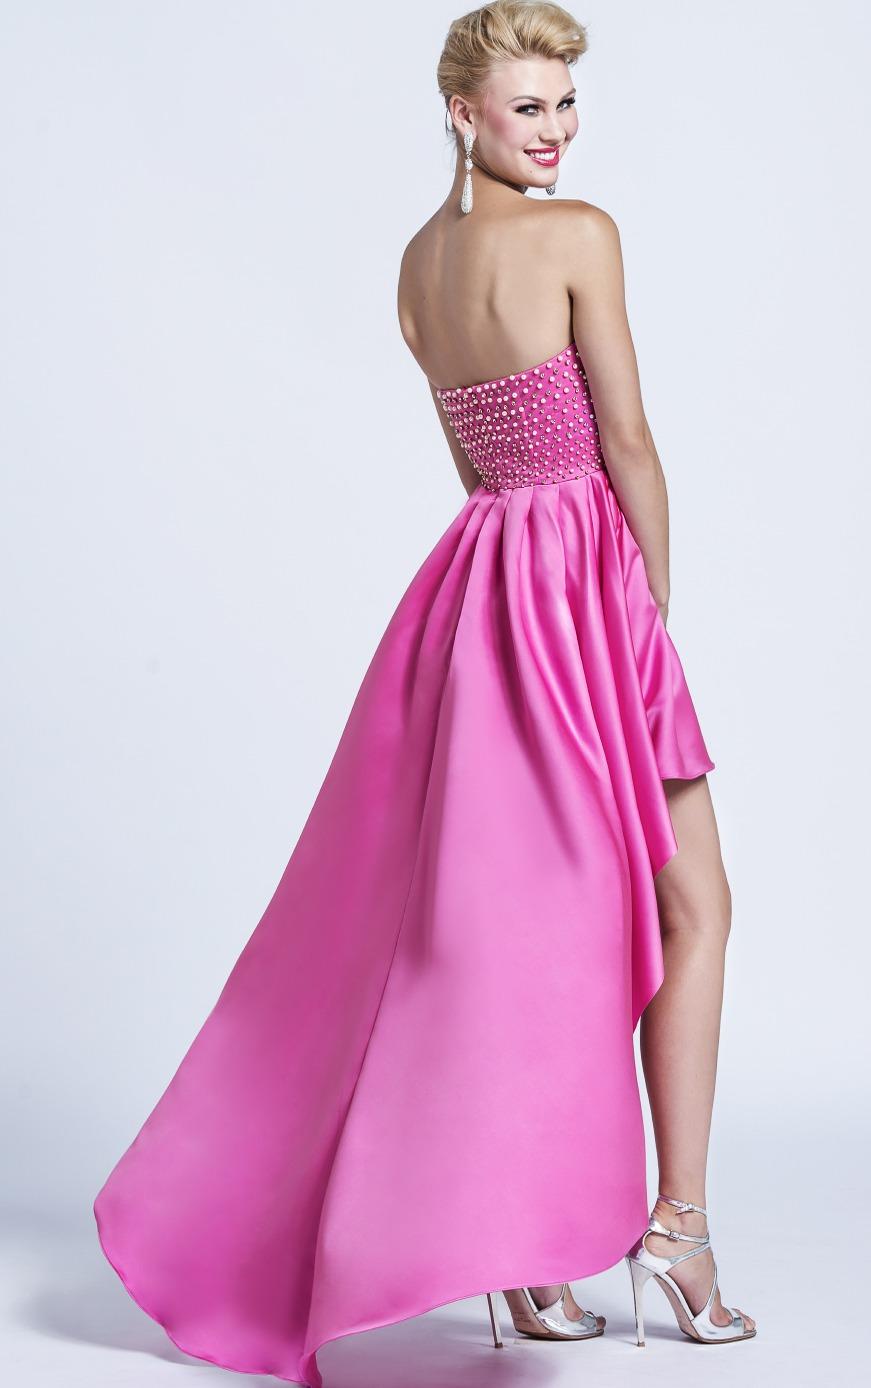 pink dress back